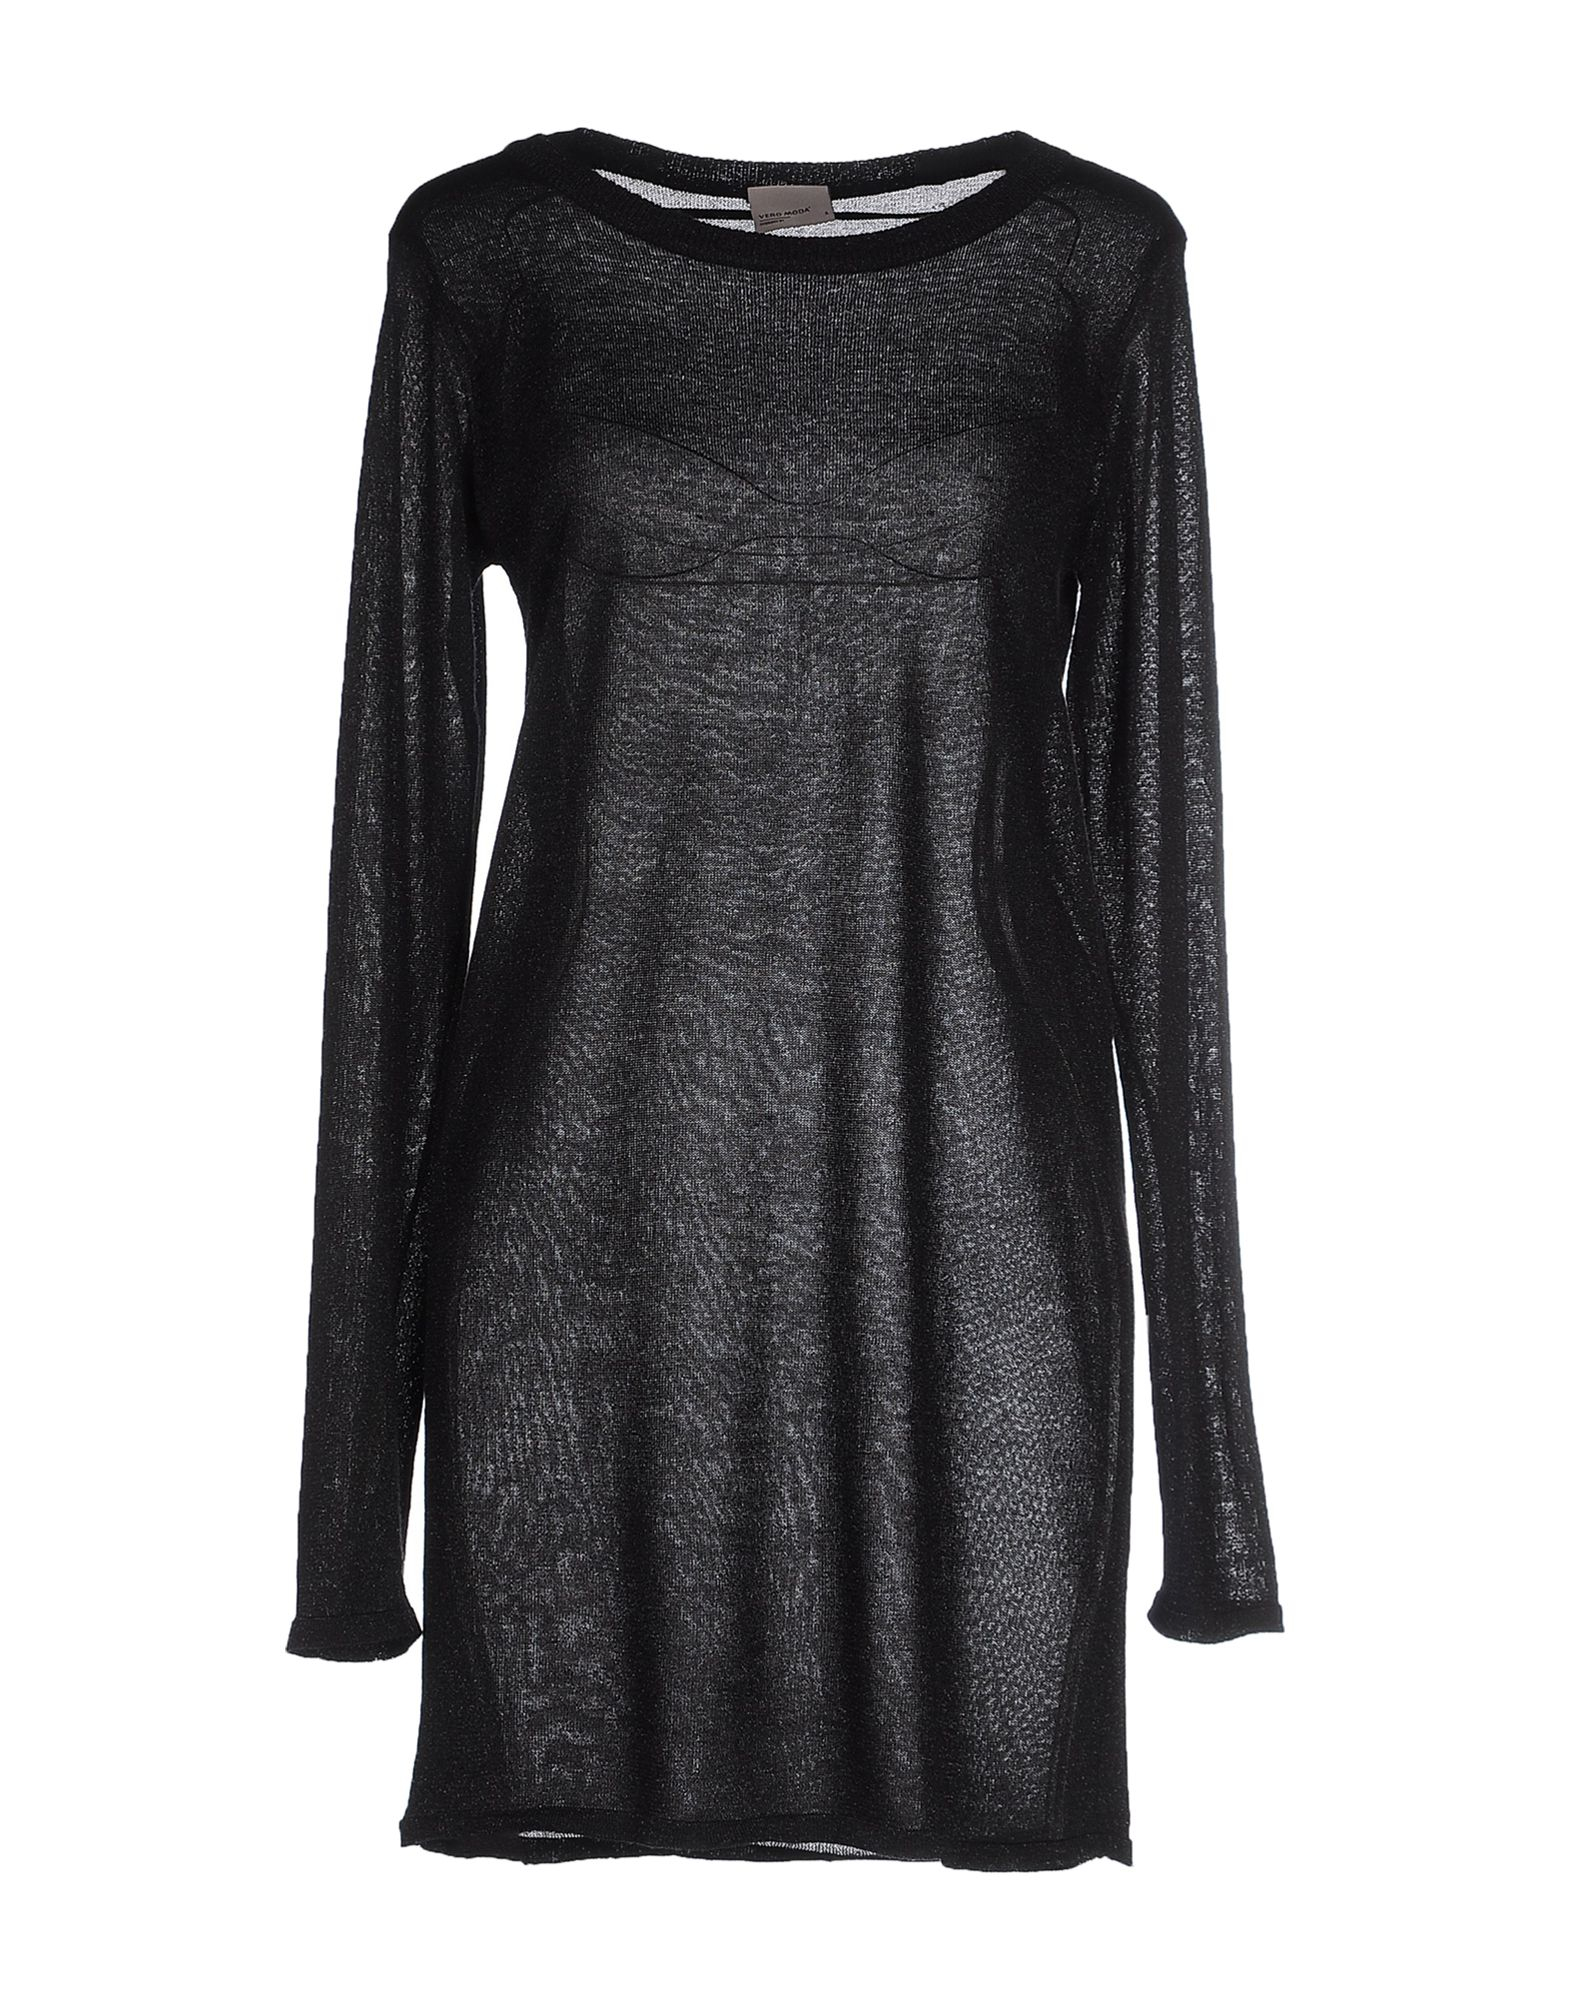 lyst vero moda short dress in black. Black Bedroom Furniture Sets. Home Design Ideas